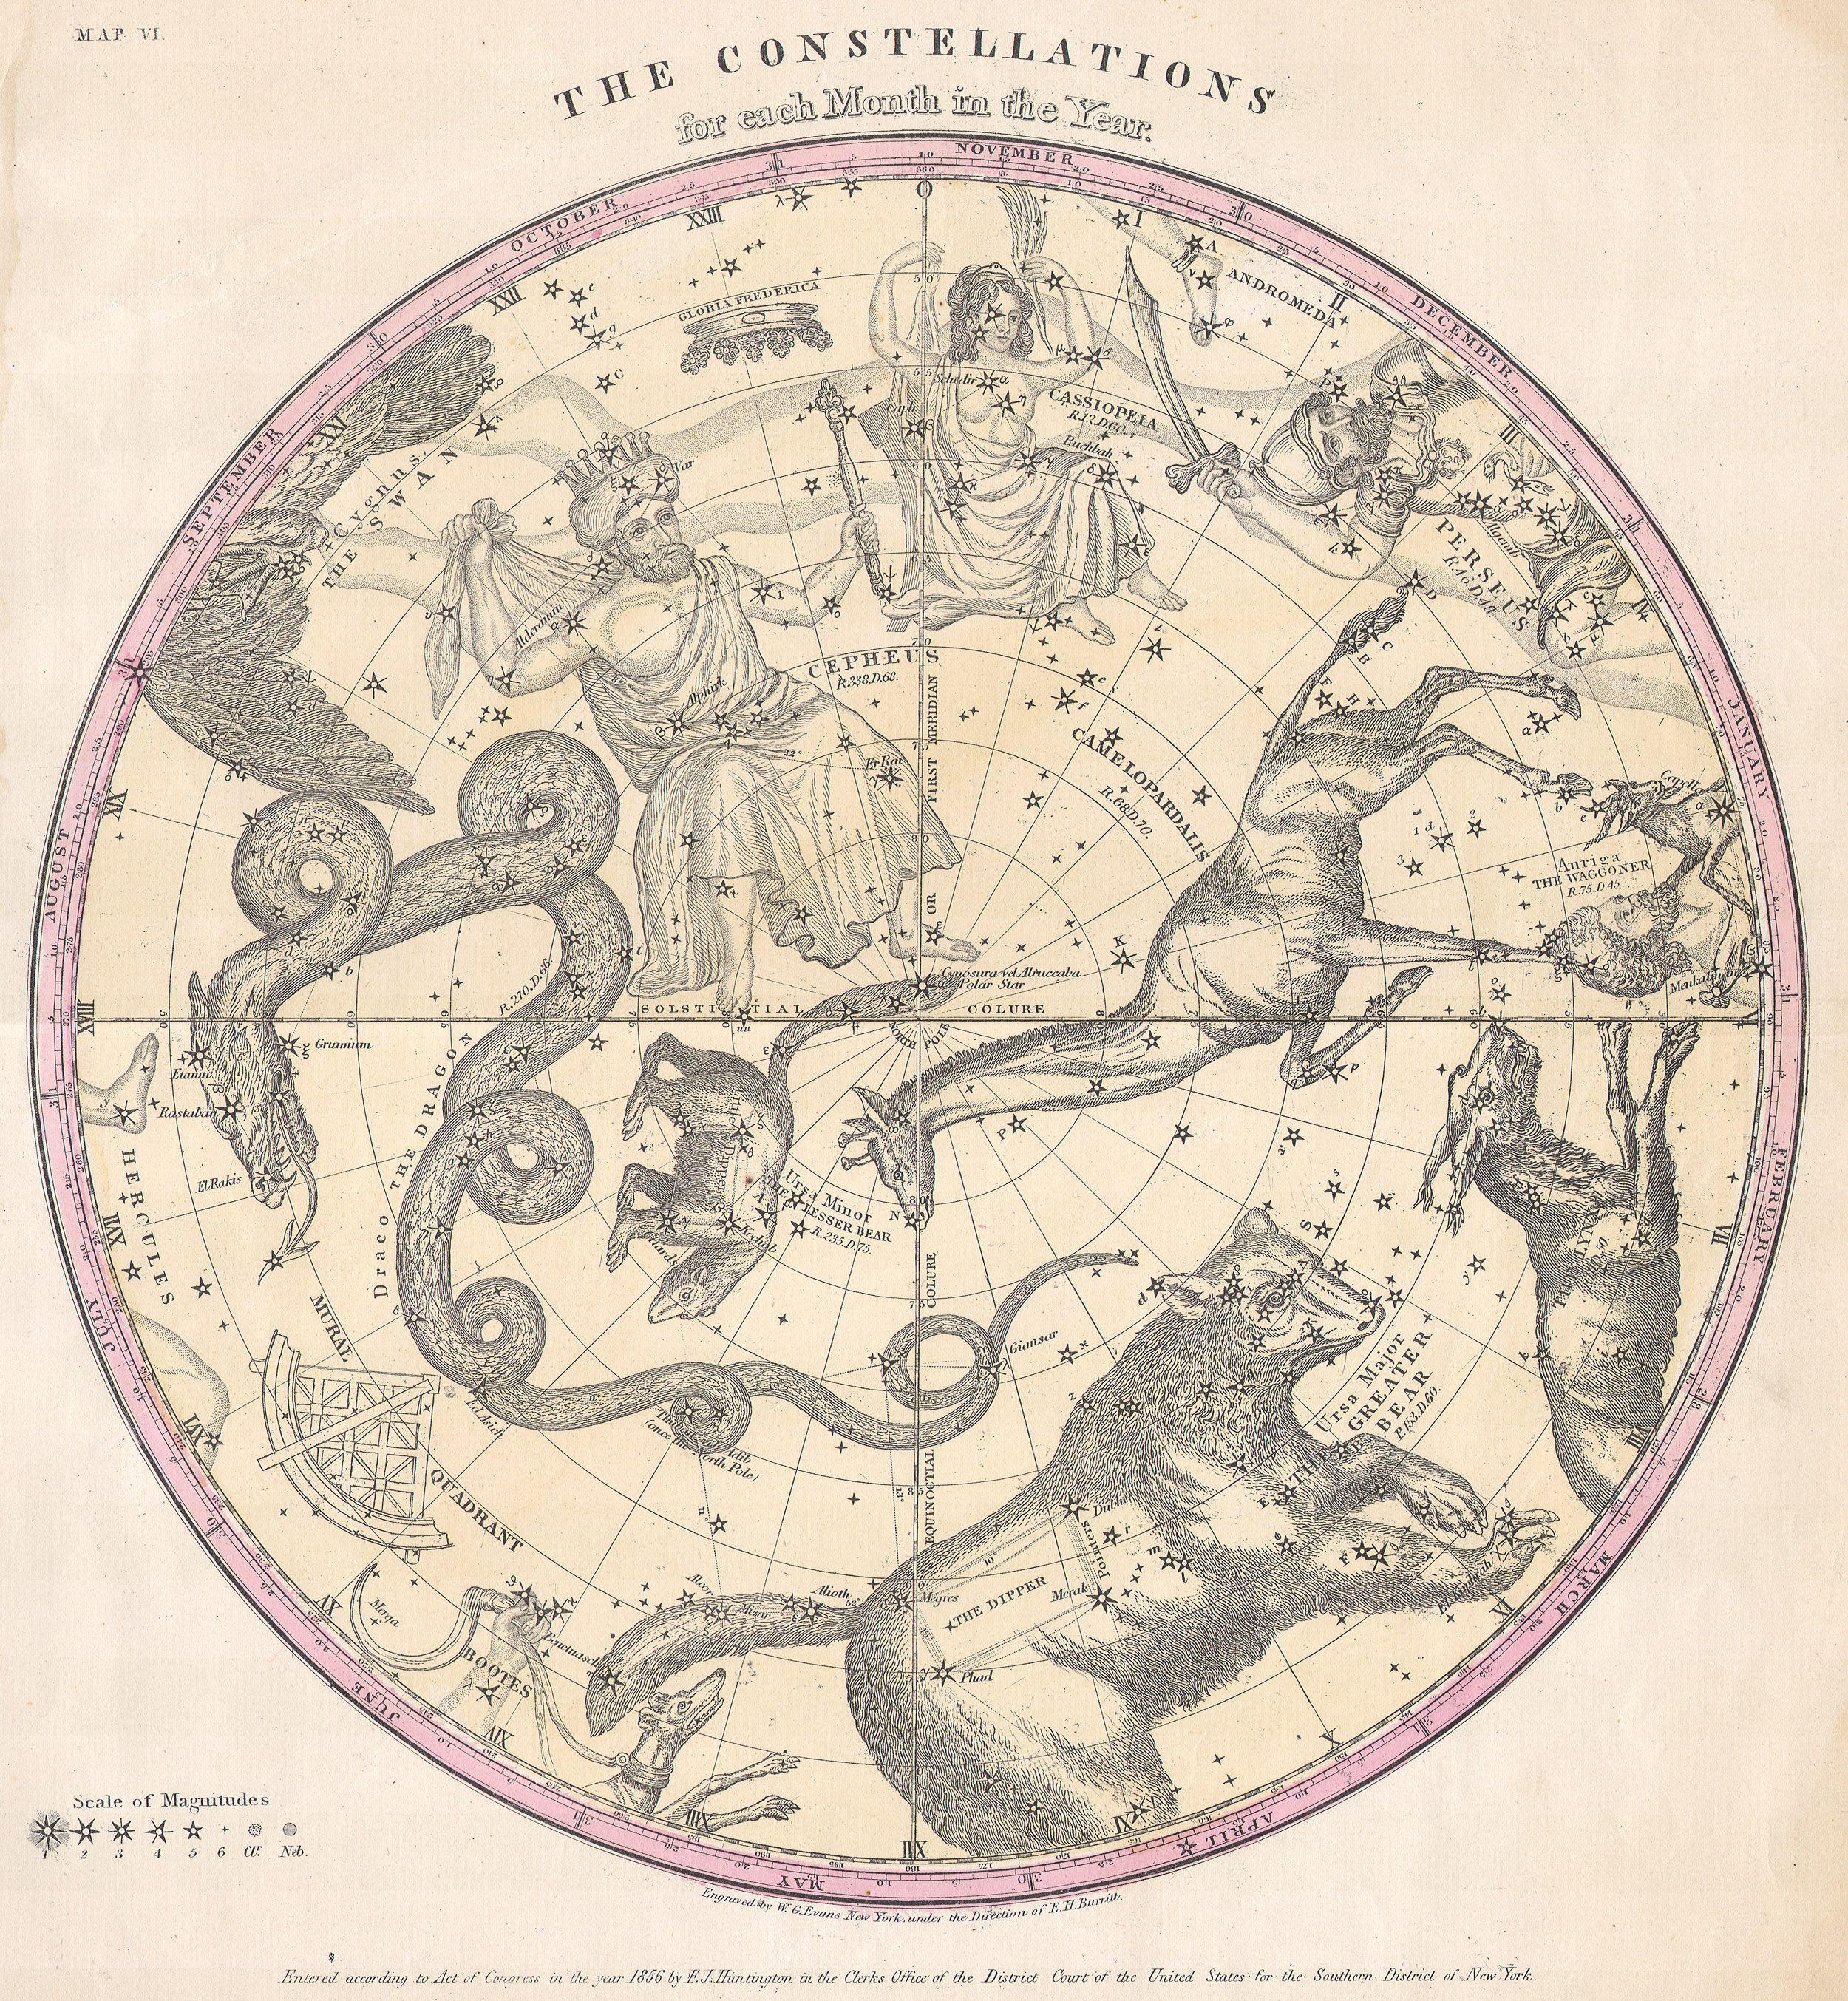 https://i0.wp.com/upload.wikimedia.org/wikipedia/commons/7/71/1856_Burritt_-_Huntington_Map_of_the_Stars_%5E_Constellations_of_the_Northern_Hemisphere_-_Geographicus_-_ConstNorth-burritt-1856.jpg